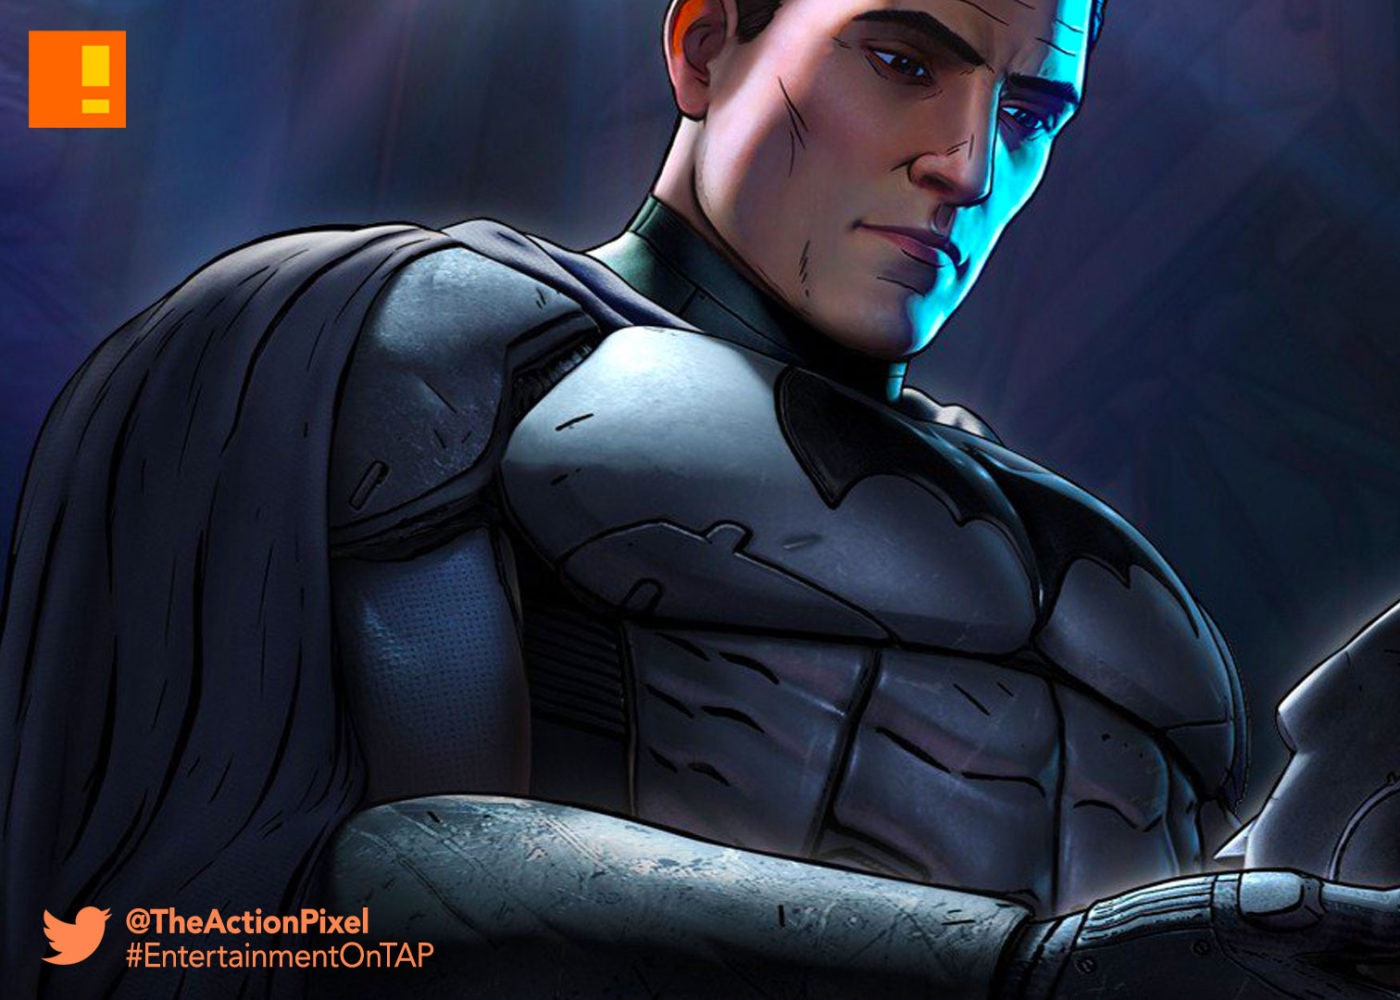 batman, batman: the telltale game, telltale games, dc comics, bruce wayne, children of arkham, episode 2, release date